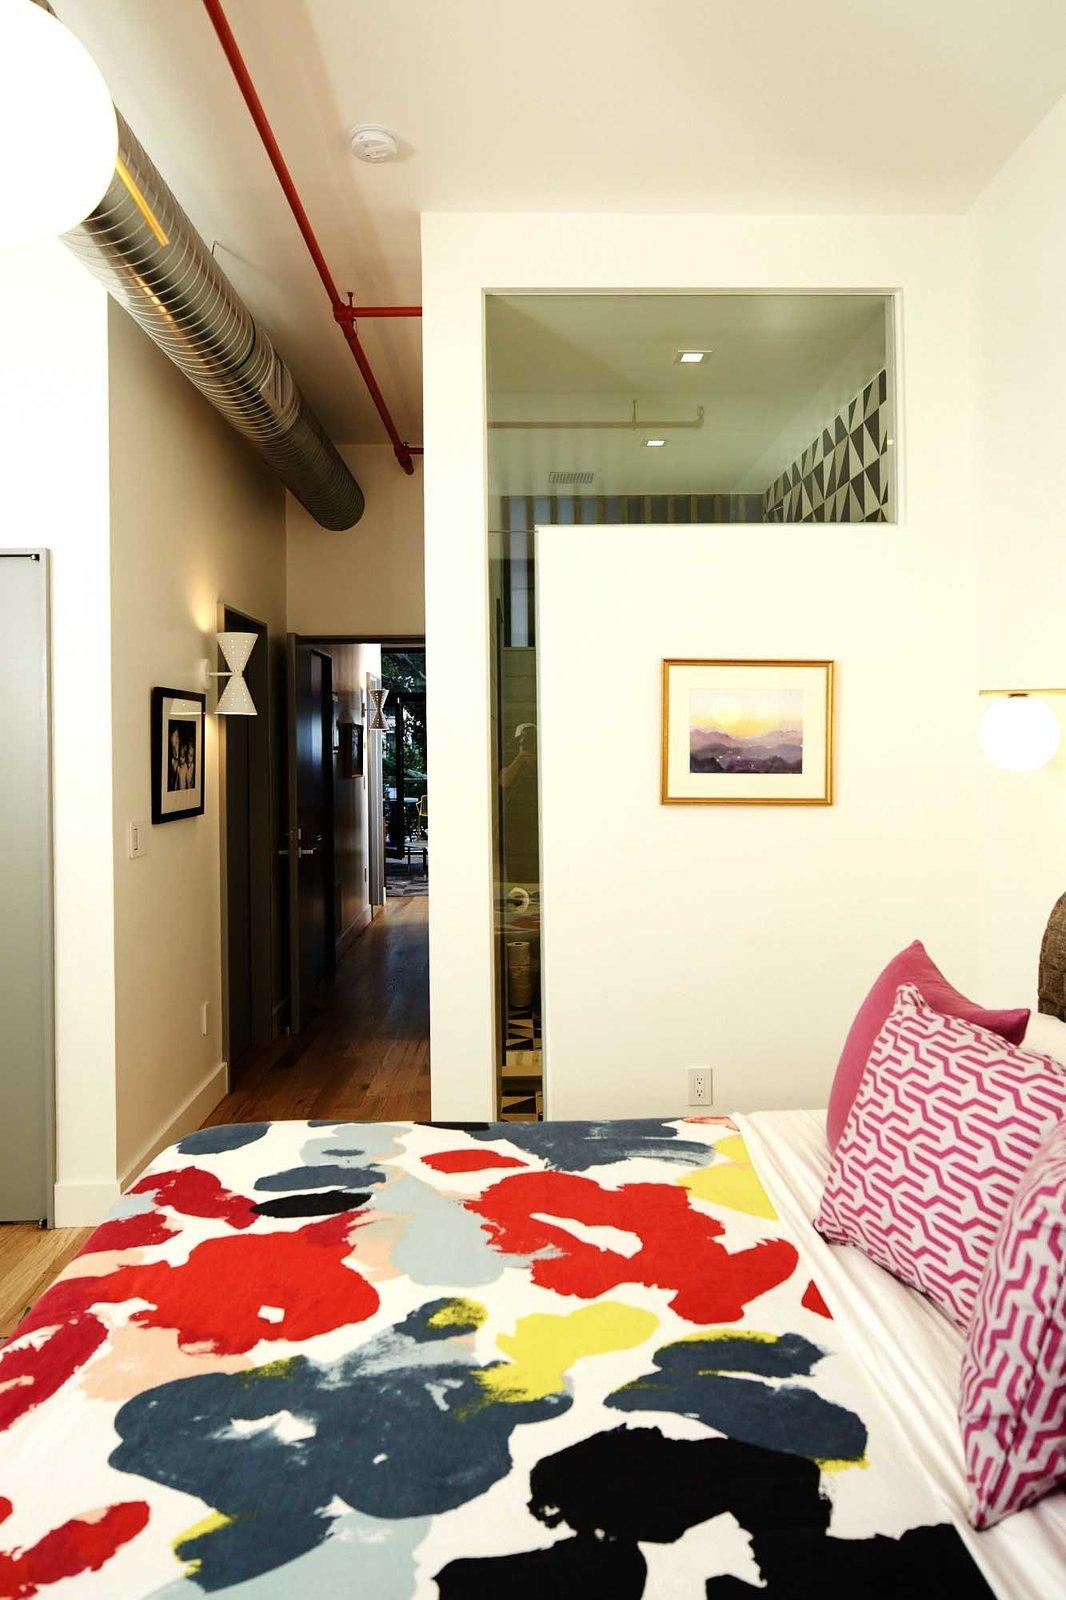 Bedroom, Medium Hardwood Floor, and Bed  Harlem Townhouse by Opera Studio Architecture